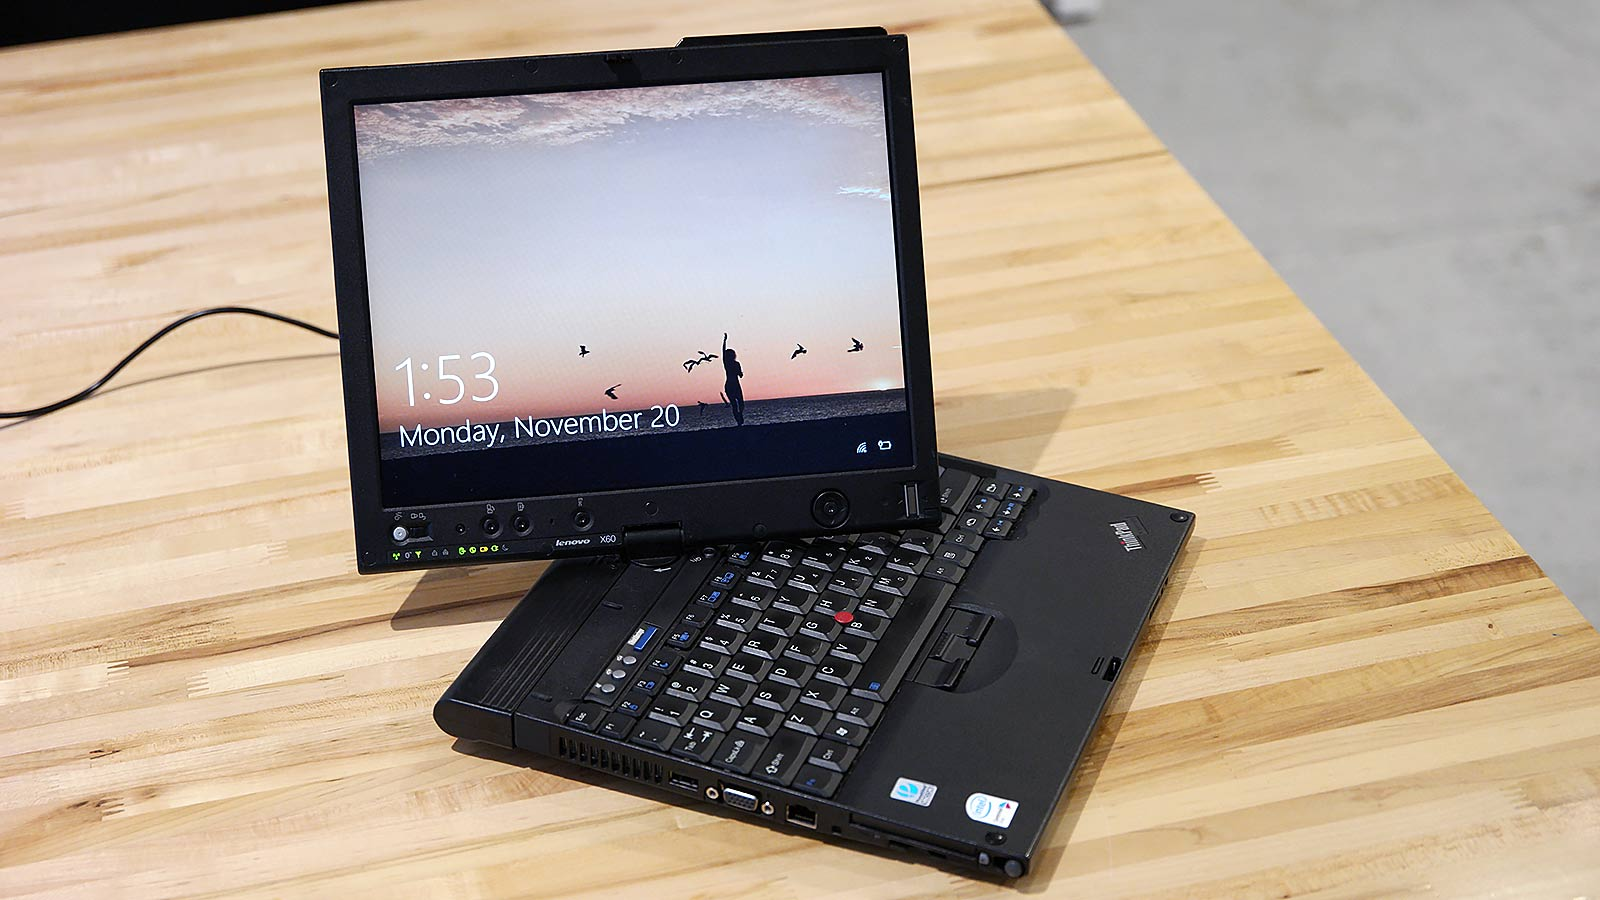 The ThinkPad X60 is gloriously awkward.